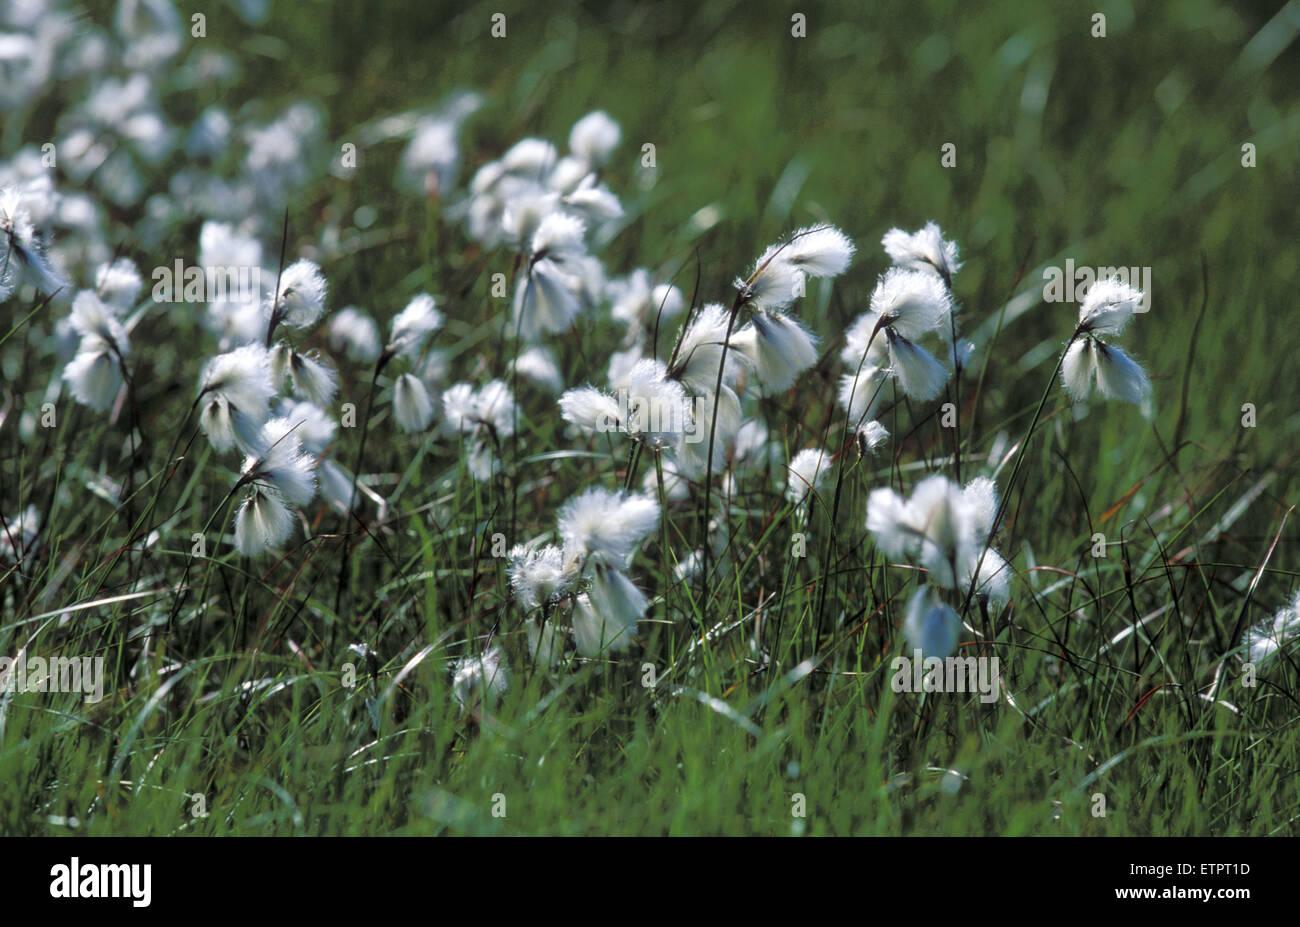 BEL, Bélgica, Eastbelgium, Hautes Fagnes, Hohes Venn, pasto de algodón. BEL, Belgien, Ostbelgien, Hohes Venn, Baumwollgras. Foto de stock